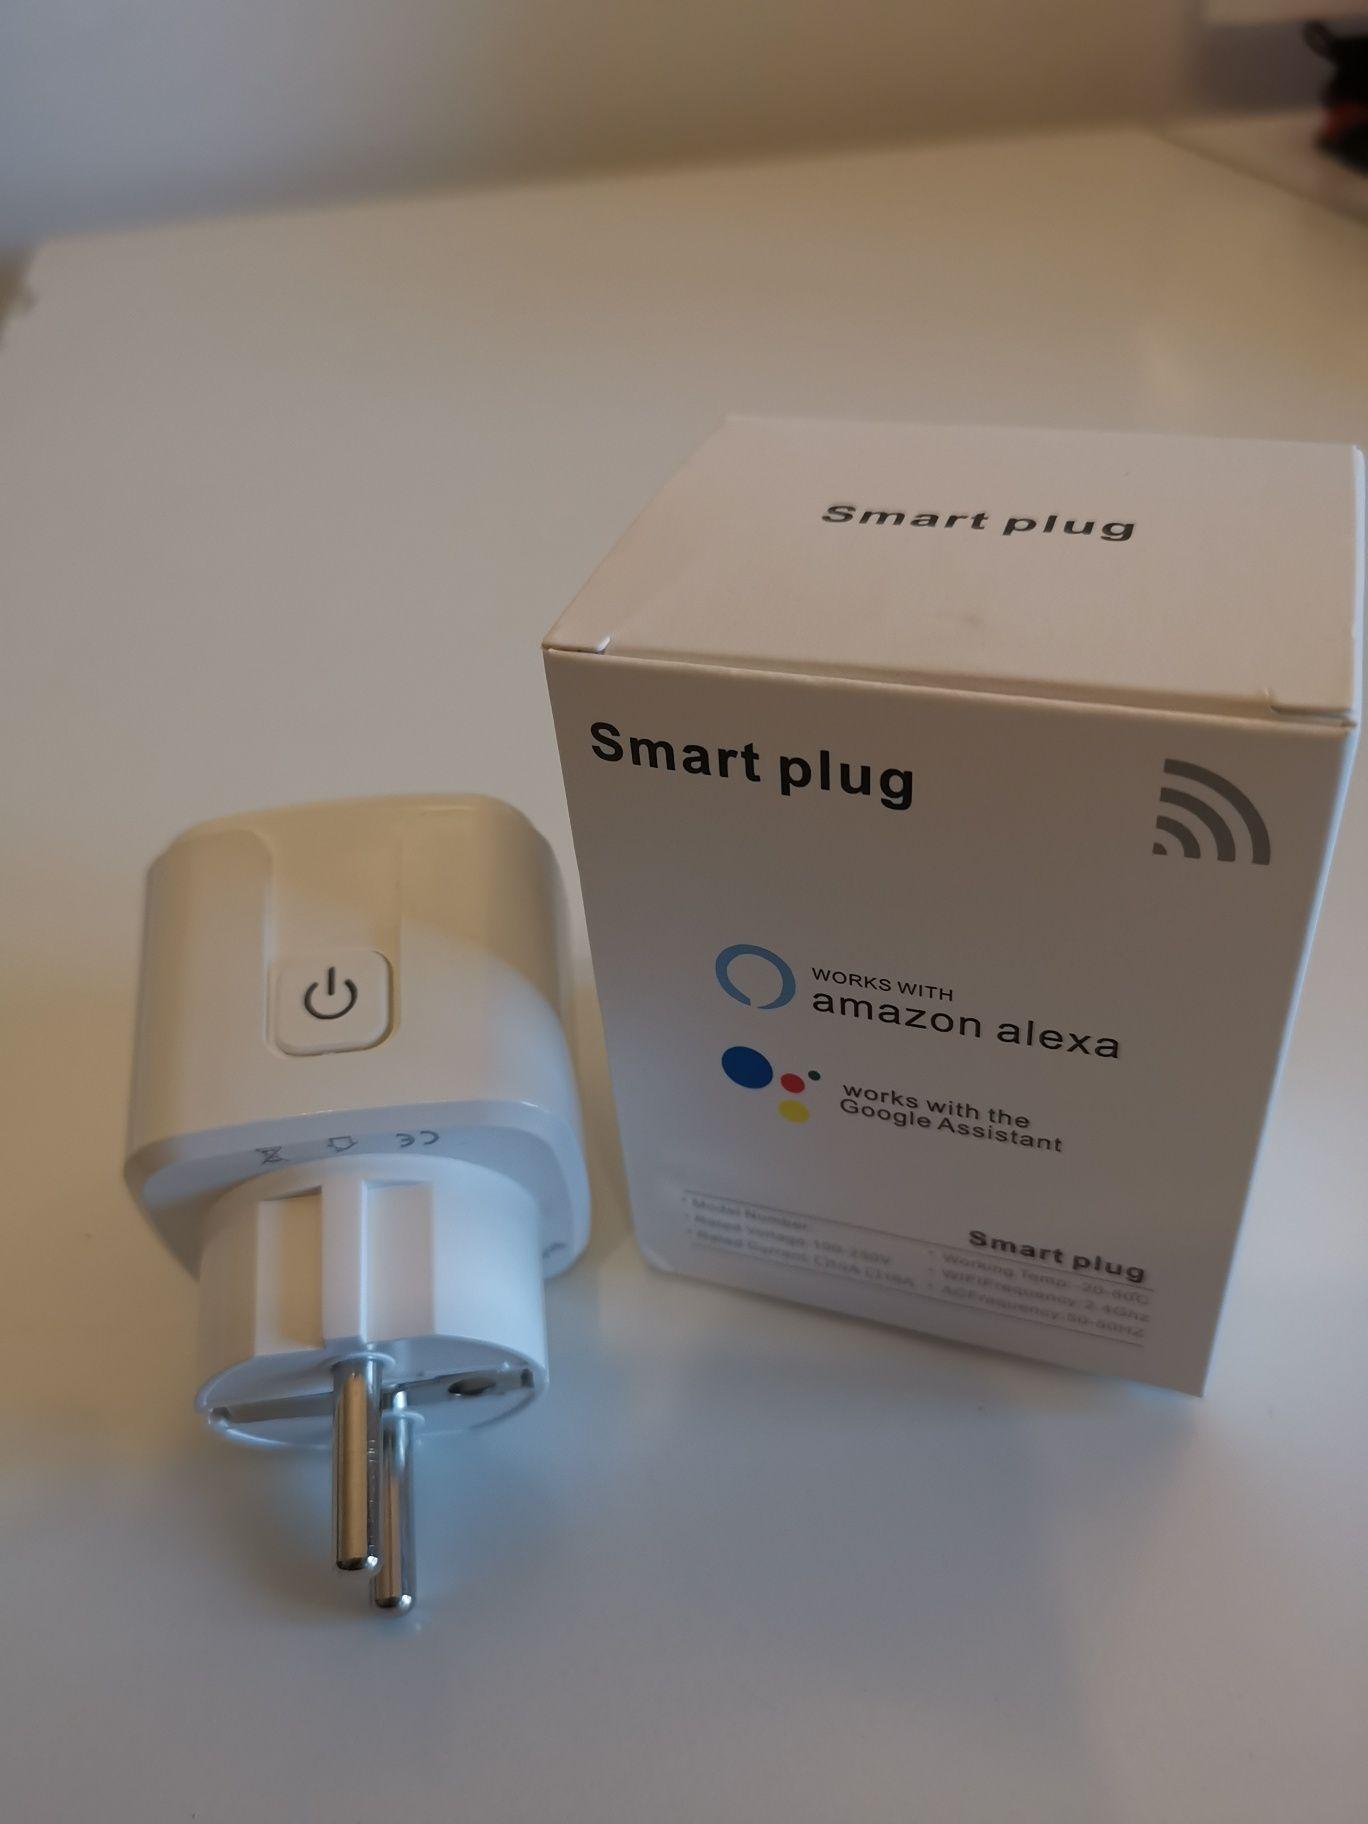 Tomada inteligente wifi, Amazon Alexa Google assistant